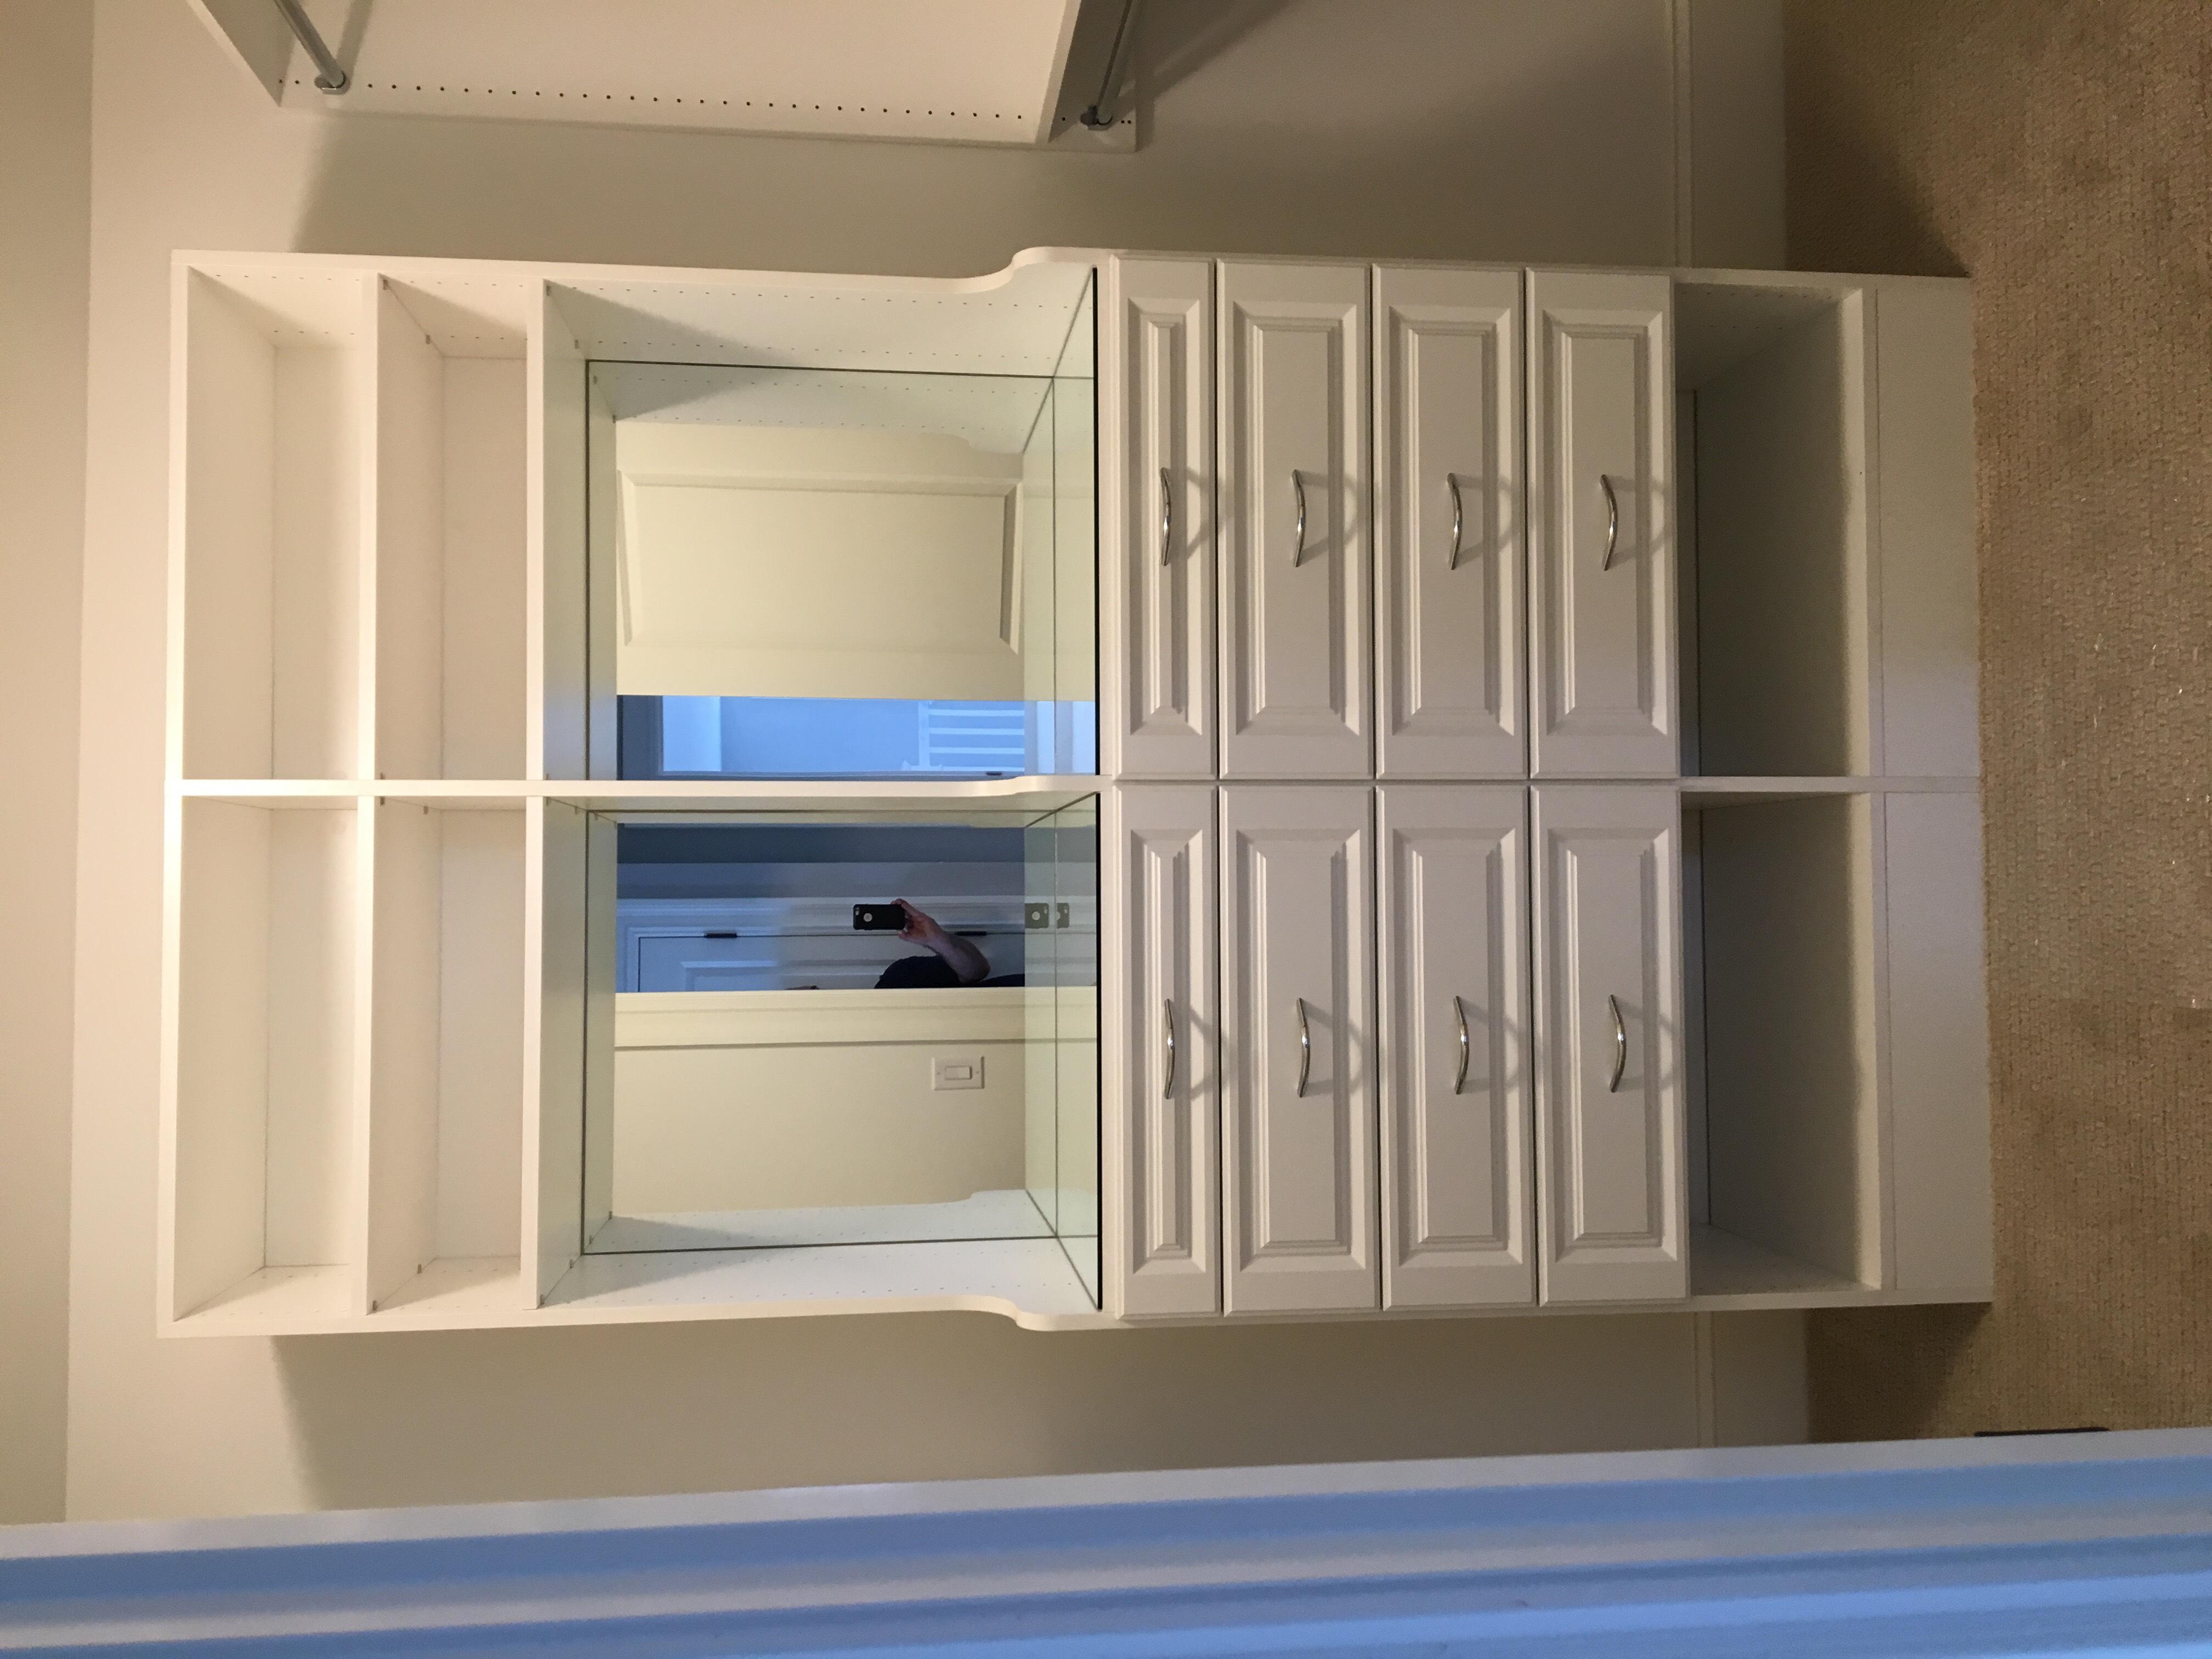 Plate Mirror inside Hutch Unit